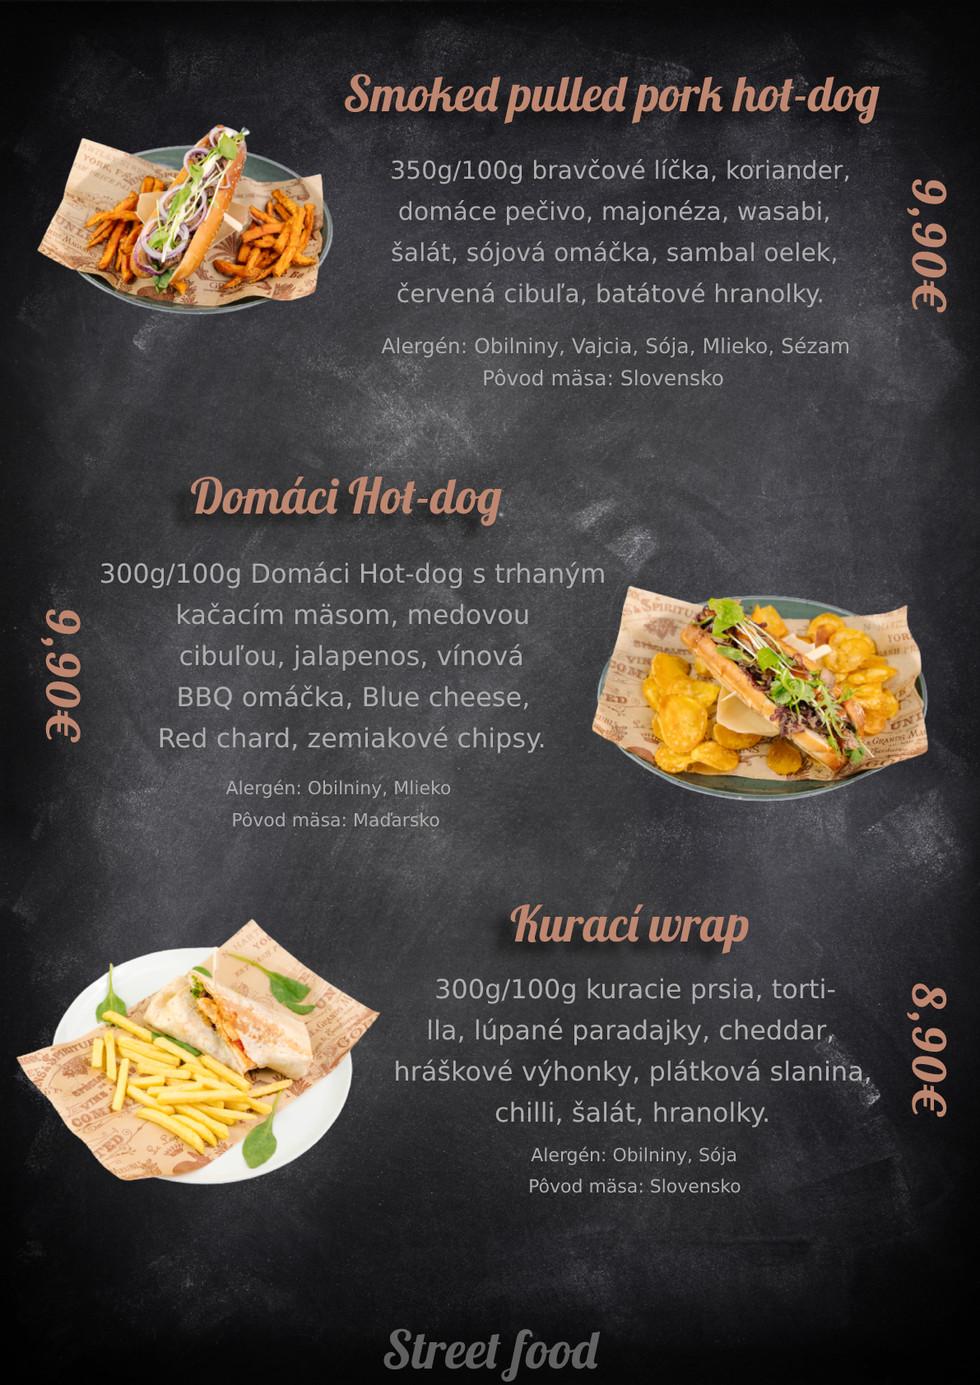 04_Street food-pdf.jpg